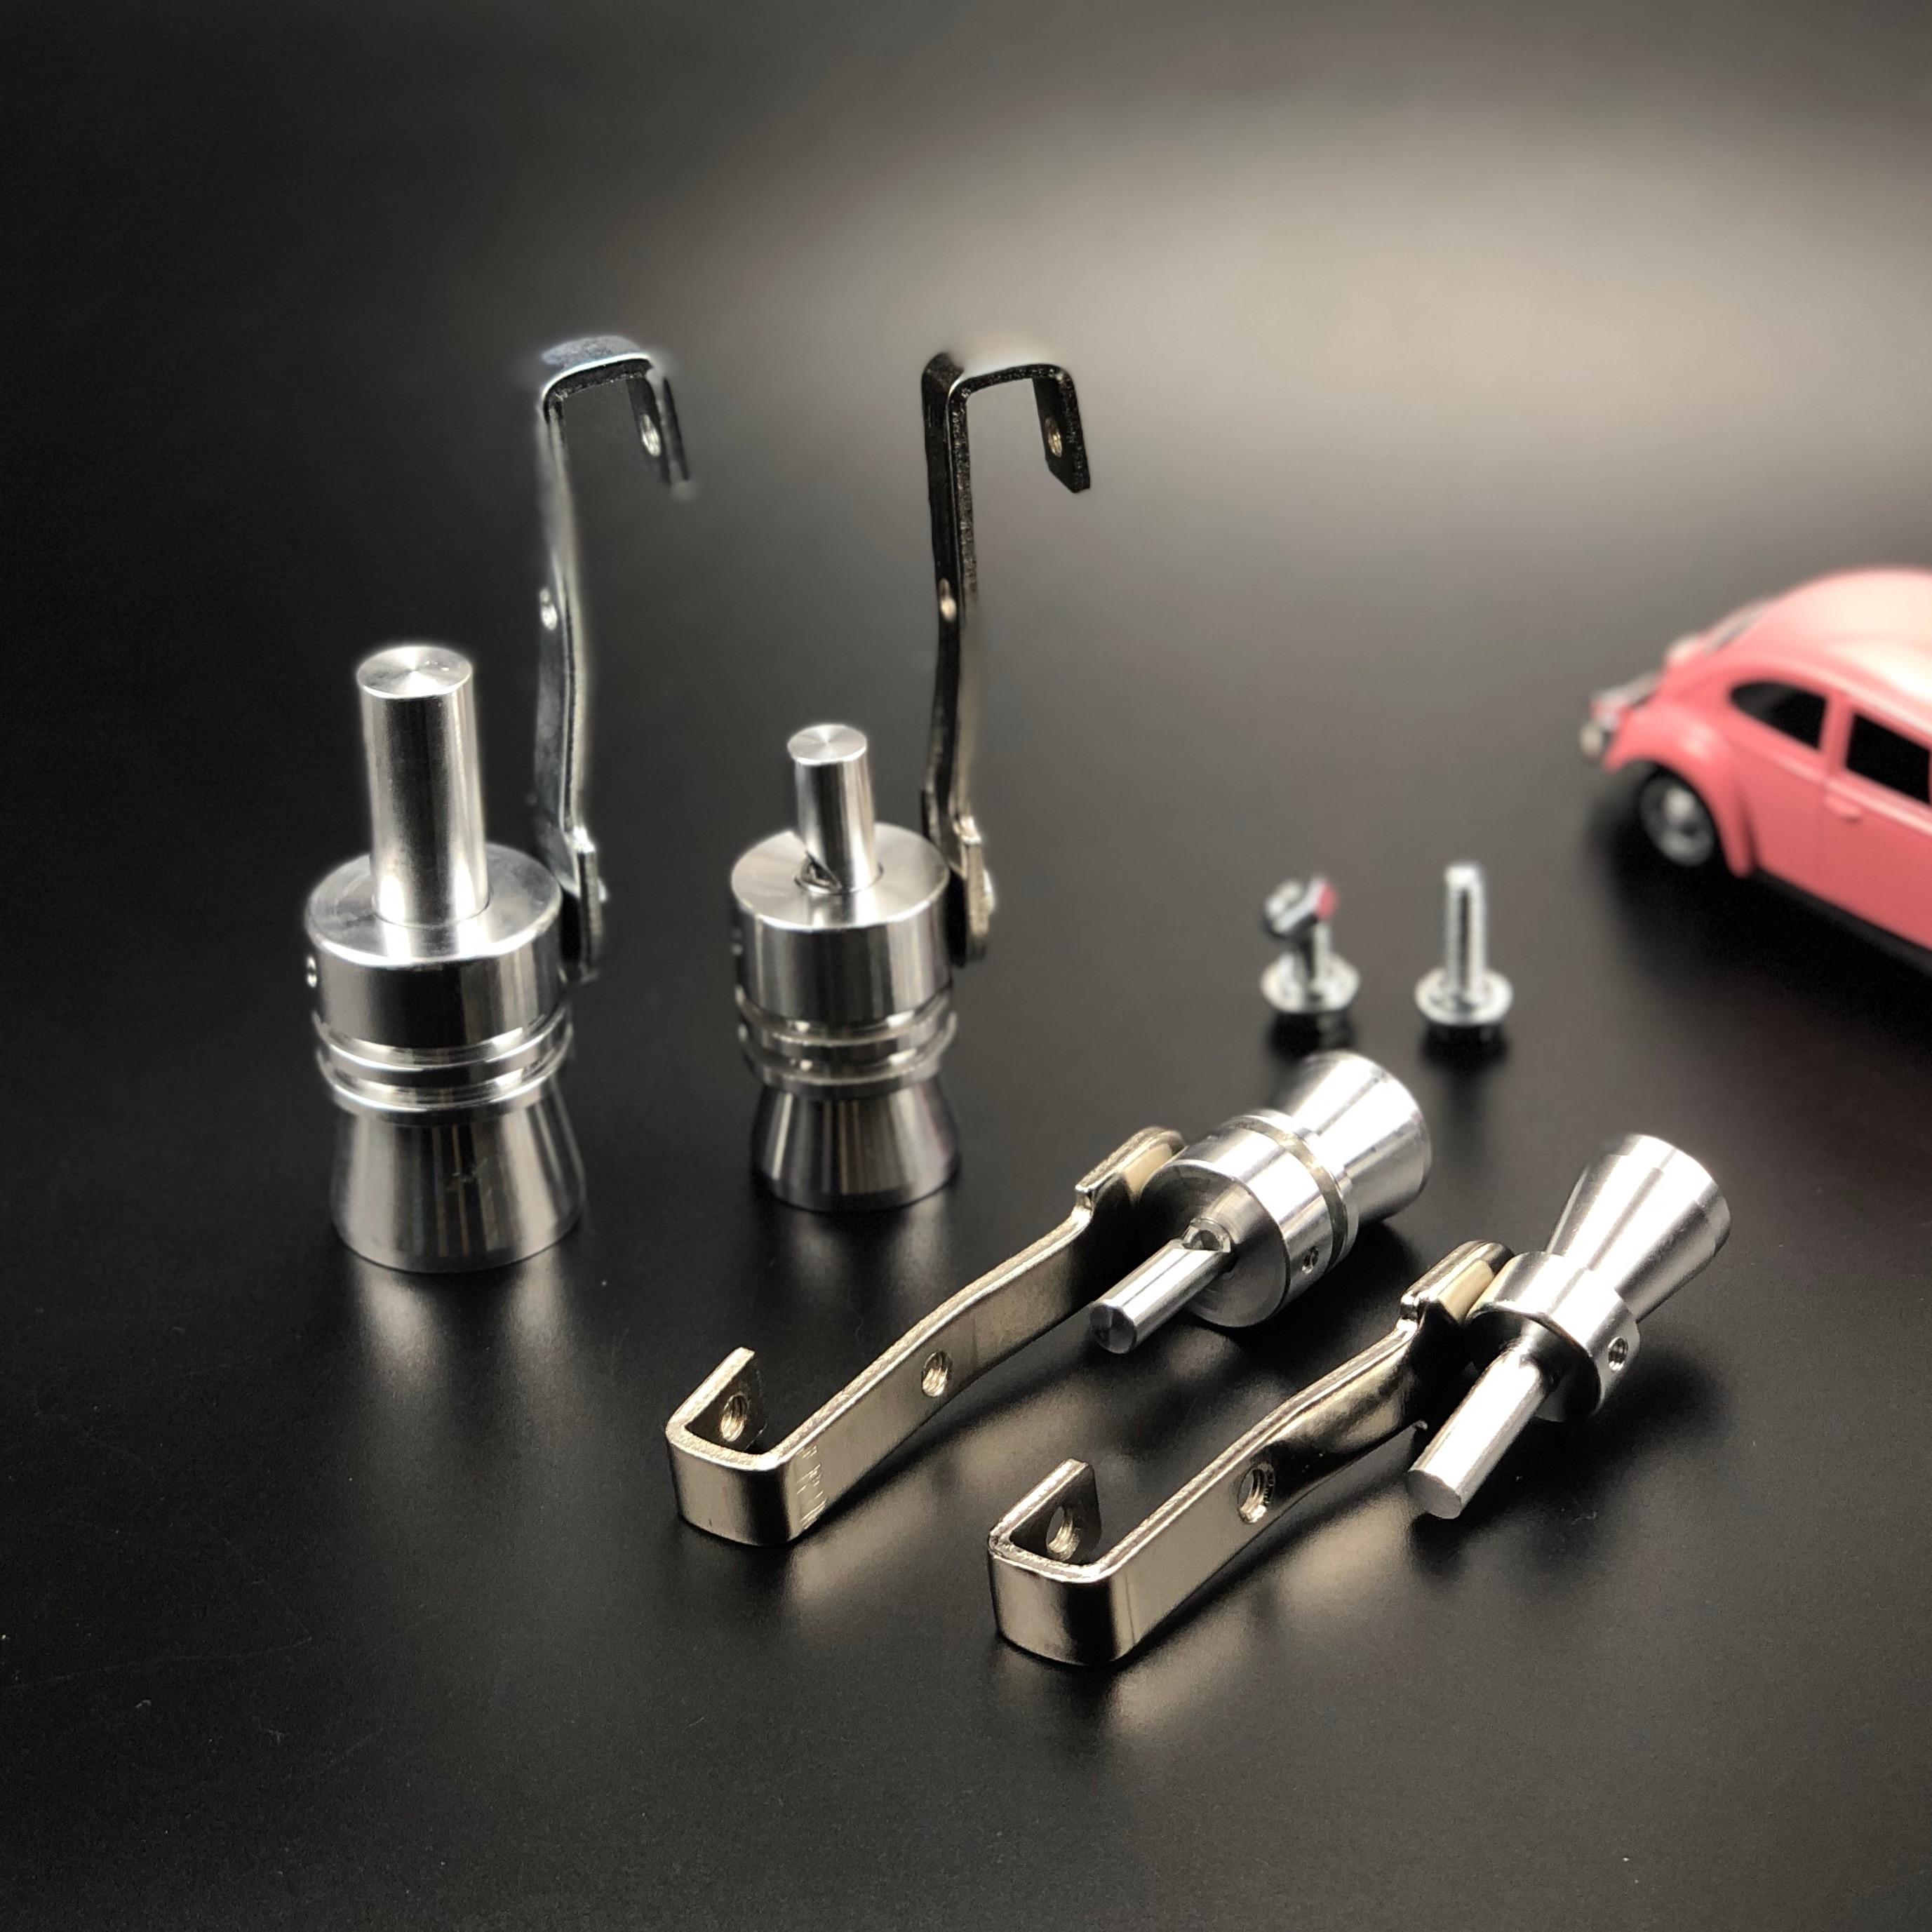 Accesorios de coche, Turbo silbato para Kia SORENTO Stinger Niro Carnival Ray Venga, procesado Stonic SP Telluride